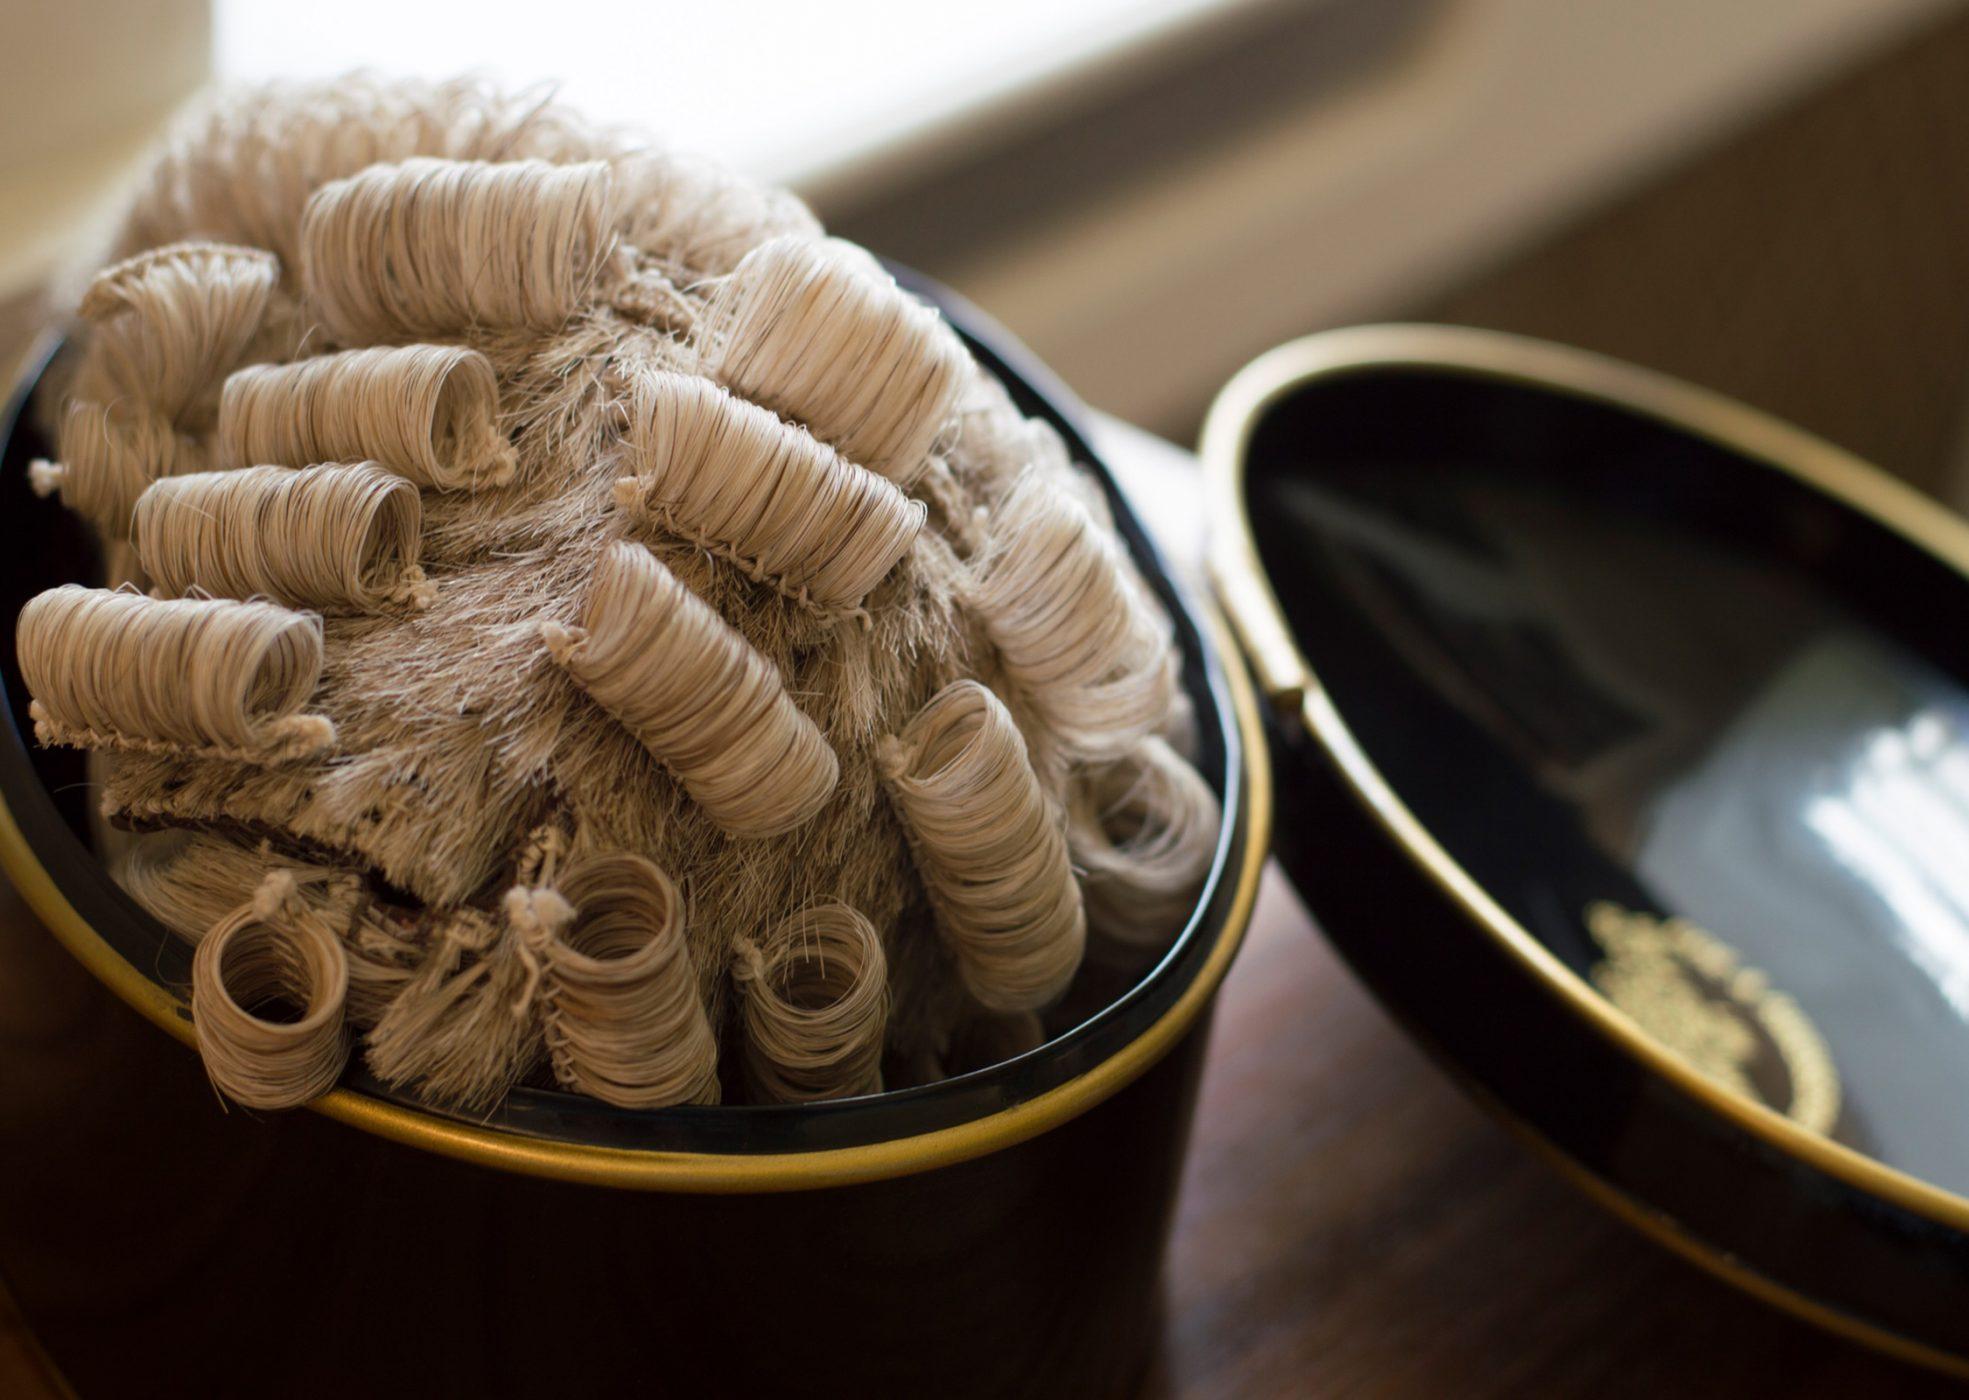 Barrister Wig, Judge Wig & Lawyer Wig